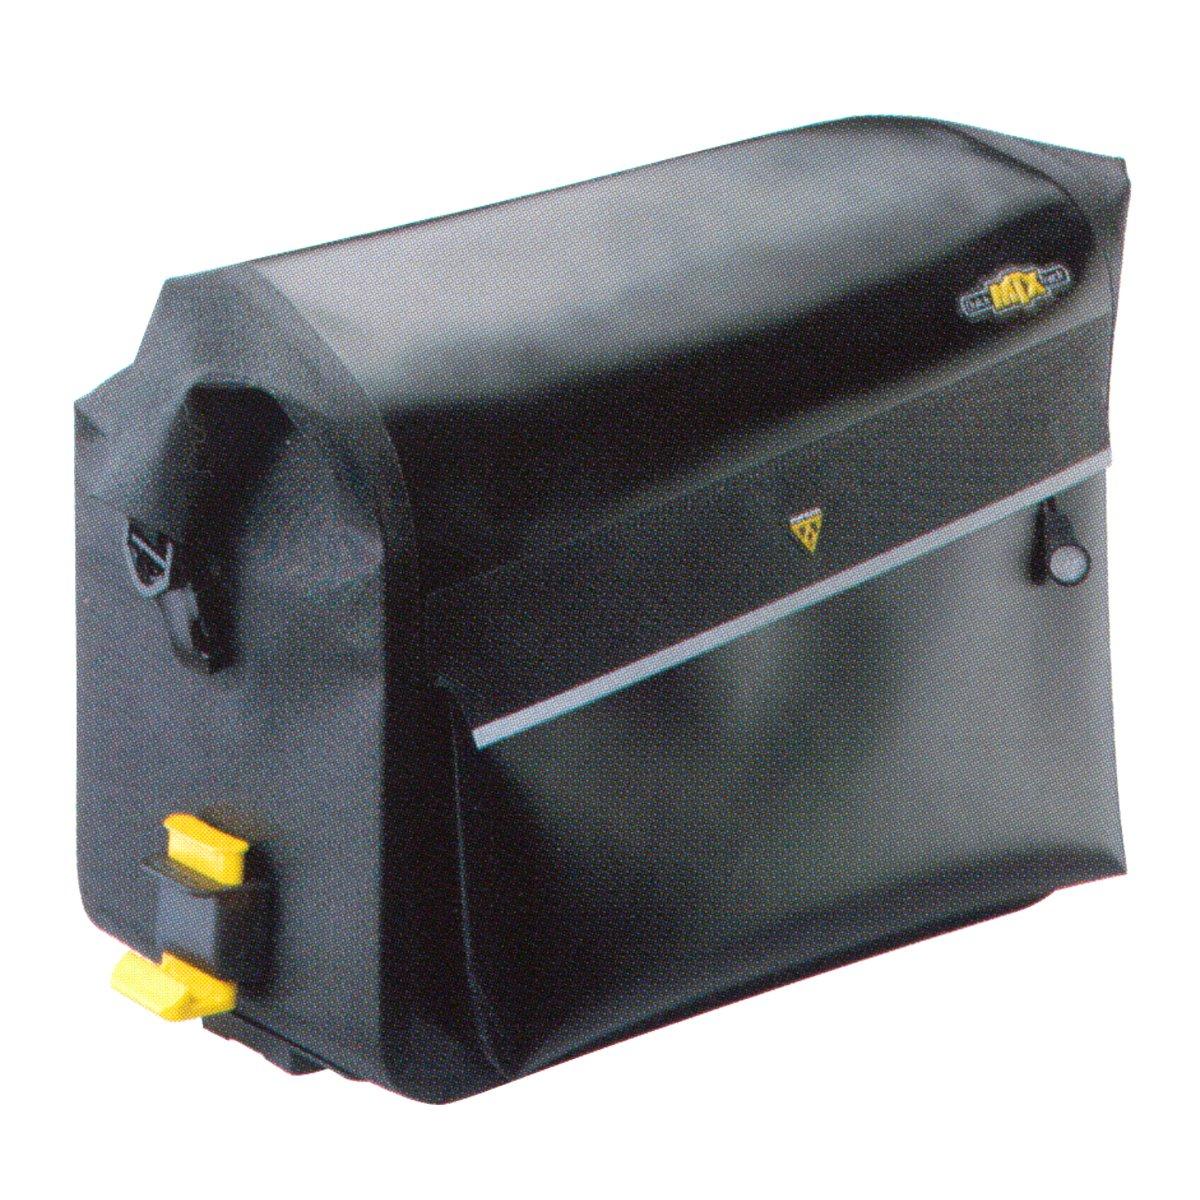 Topeak Mtx Trunk Dry Bag (Black, 15x9.4x10.2-Inch)